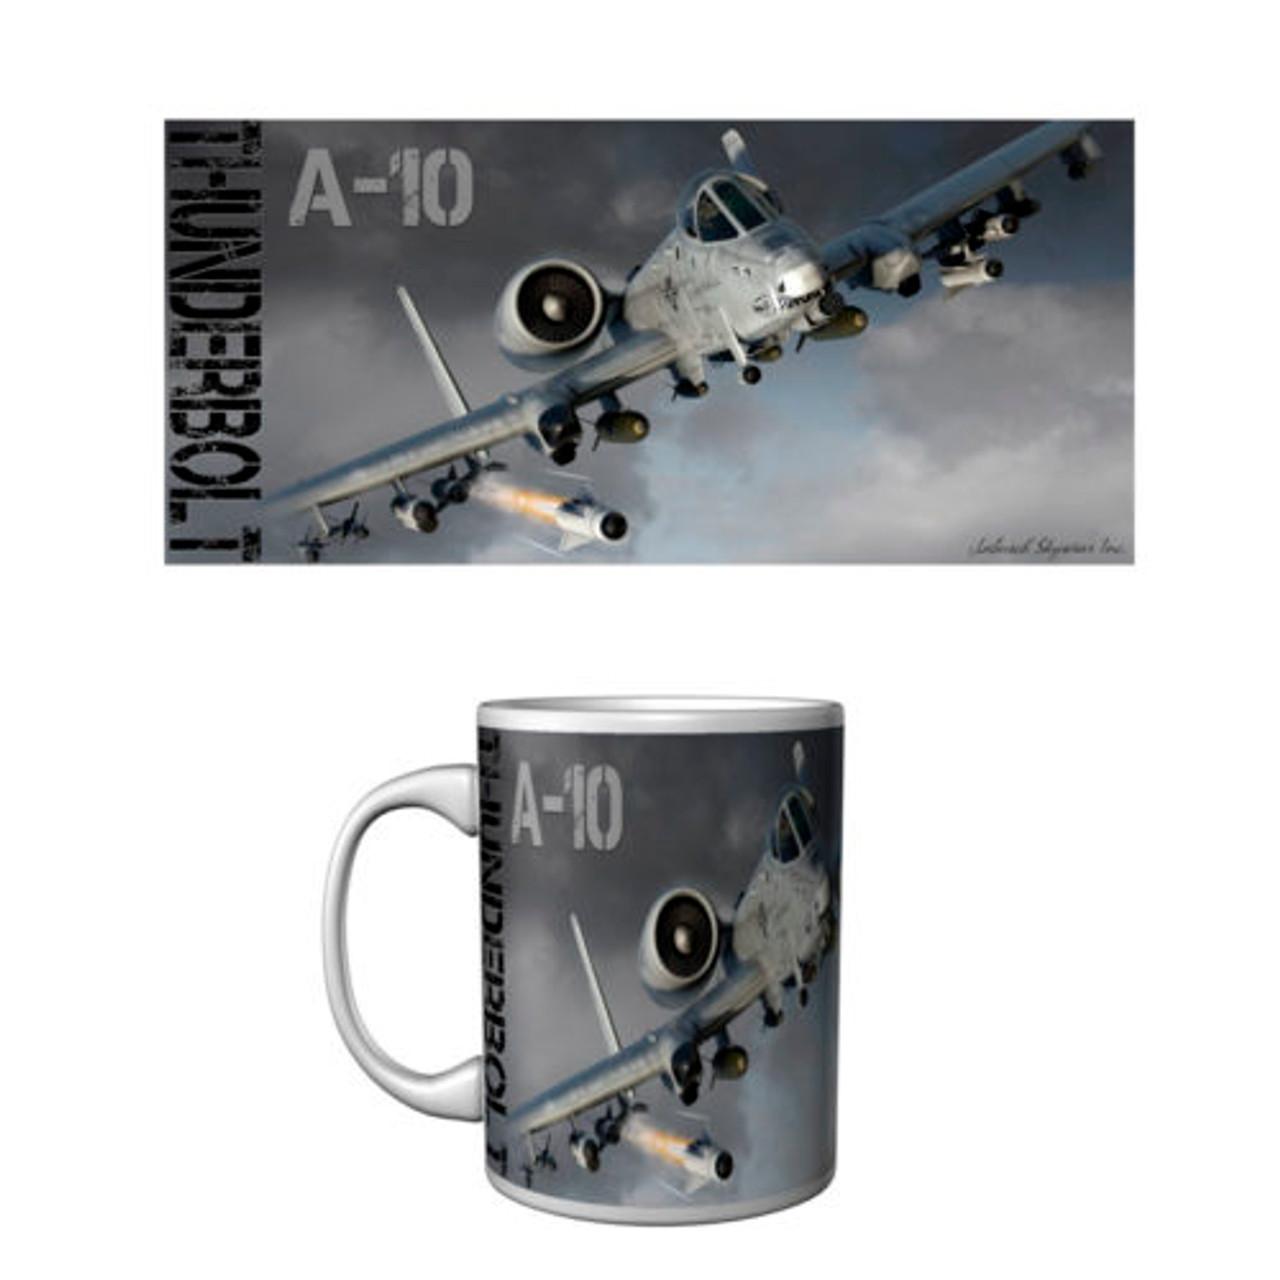 A-10 Thunderbolt Ceramic Mug